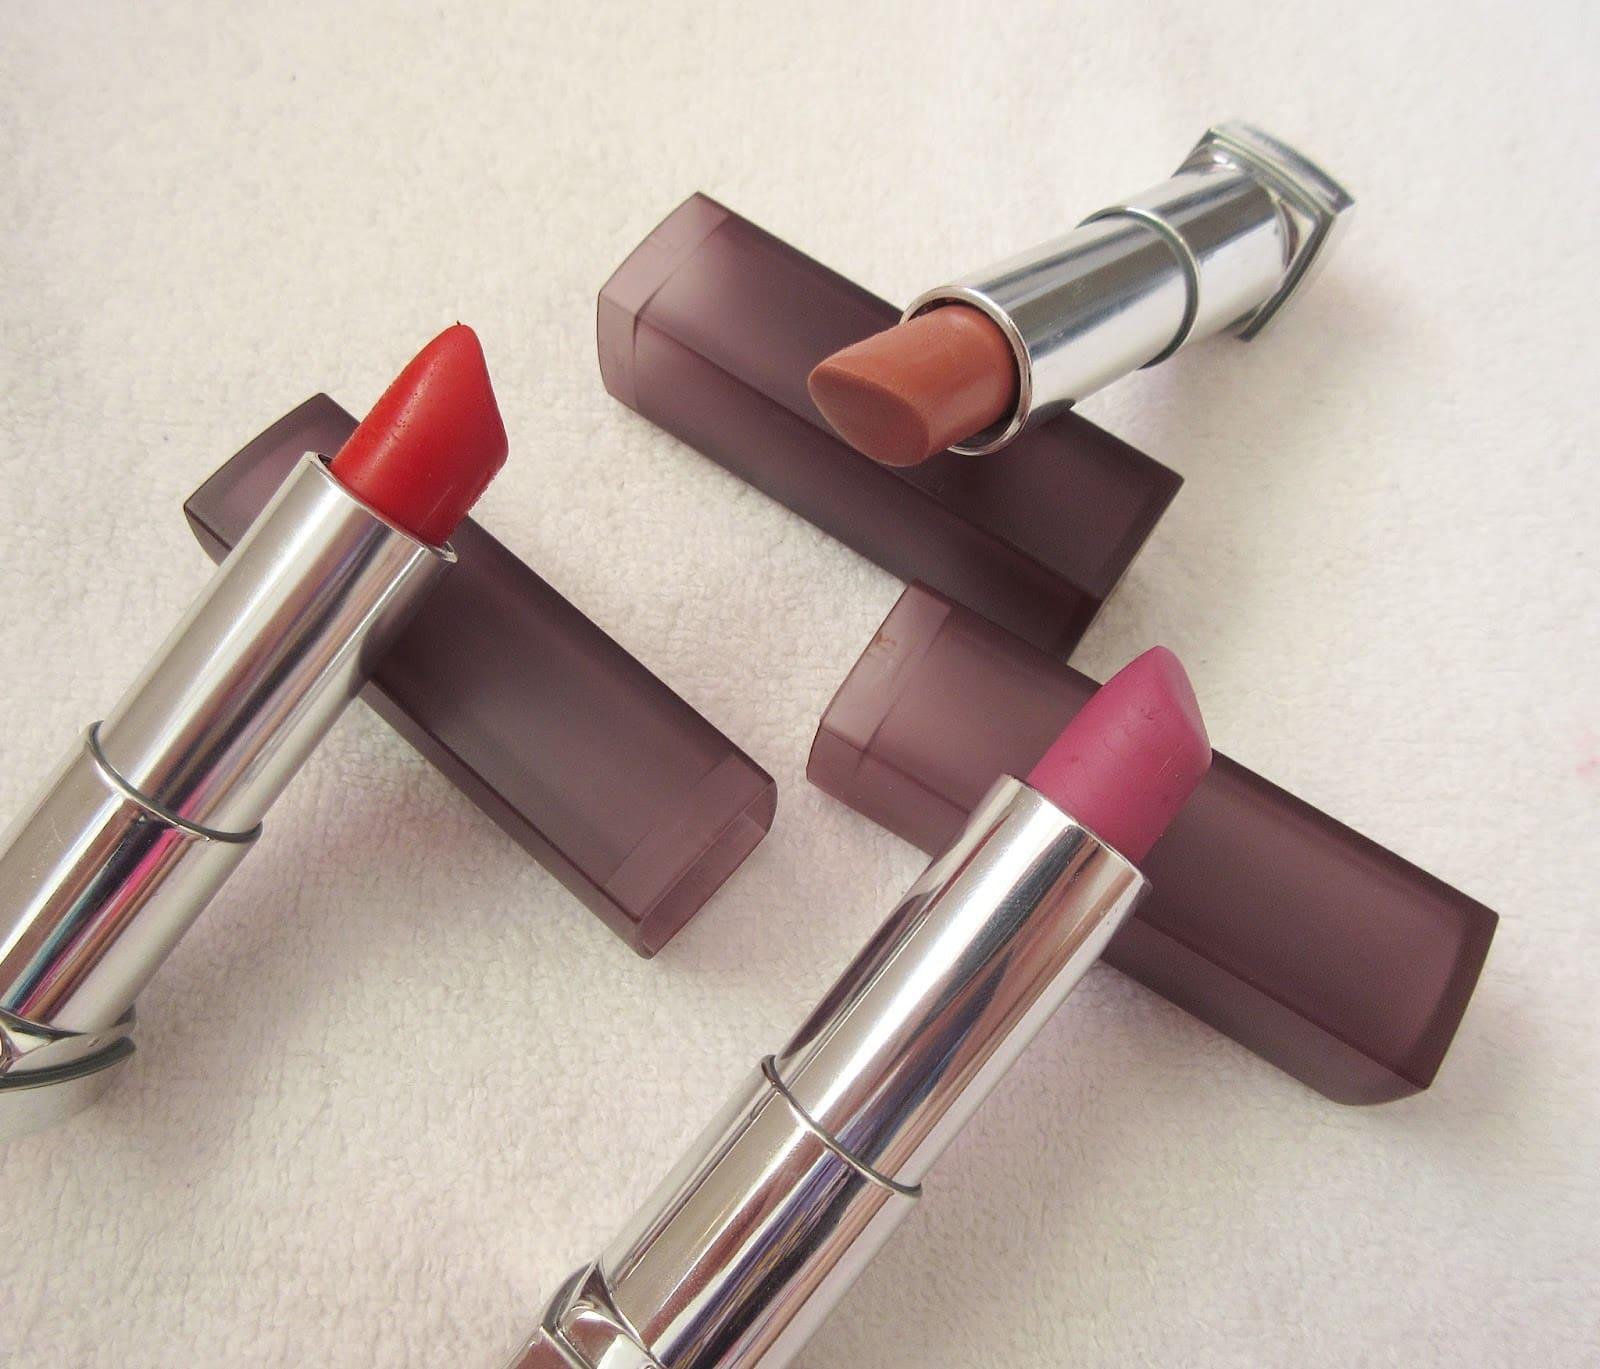 Maybelline-Colour-Sensational-Lipstick